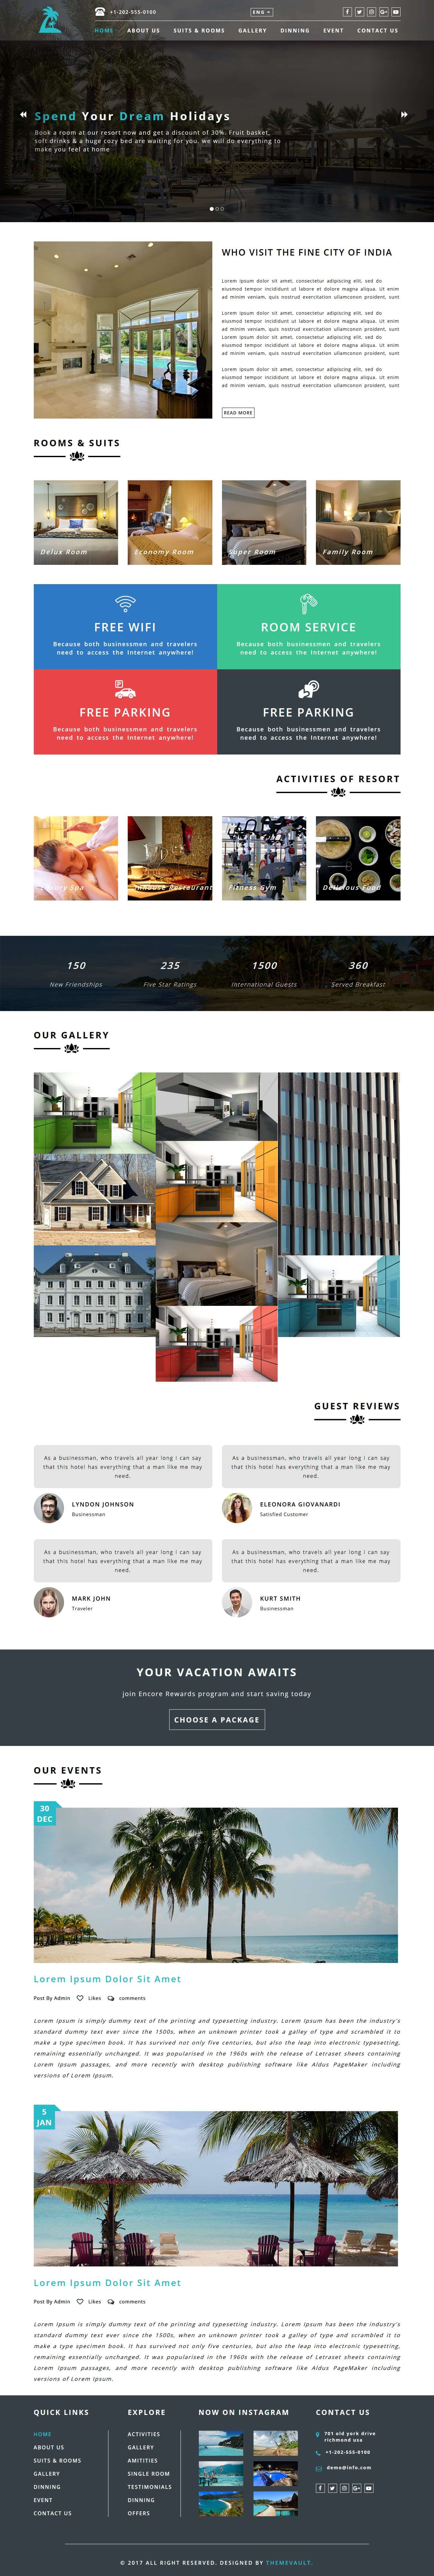 Resortono Responsive Hotel And Resort Website Template Themevault